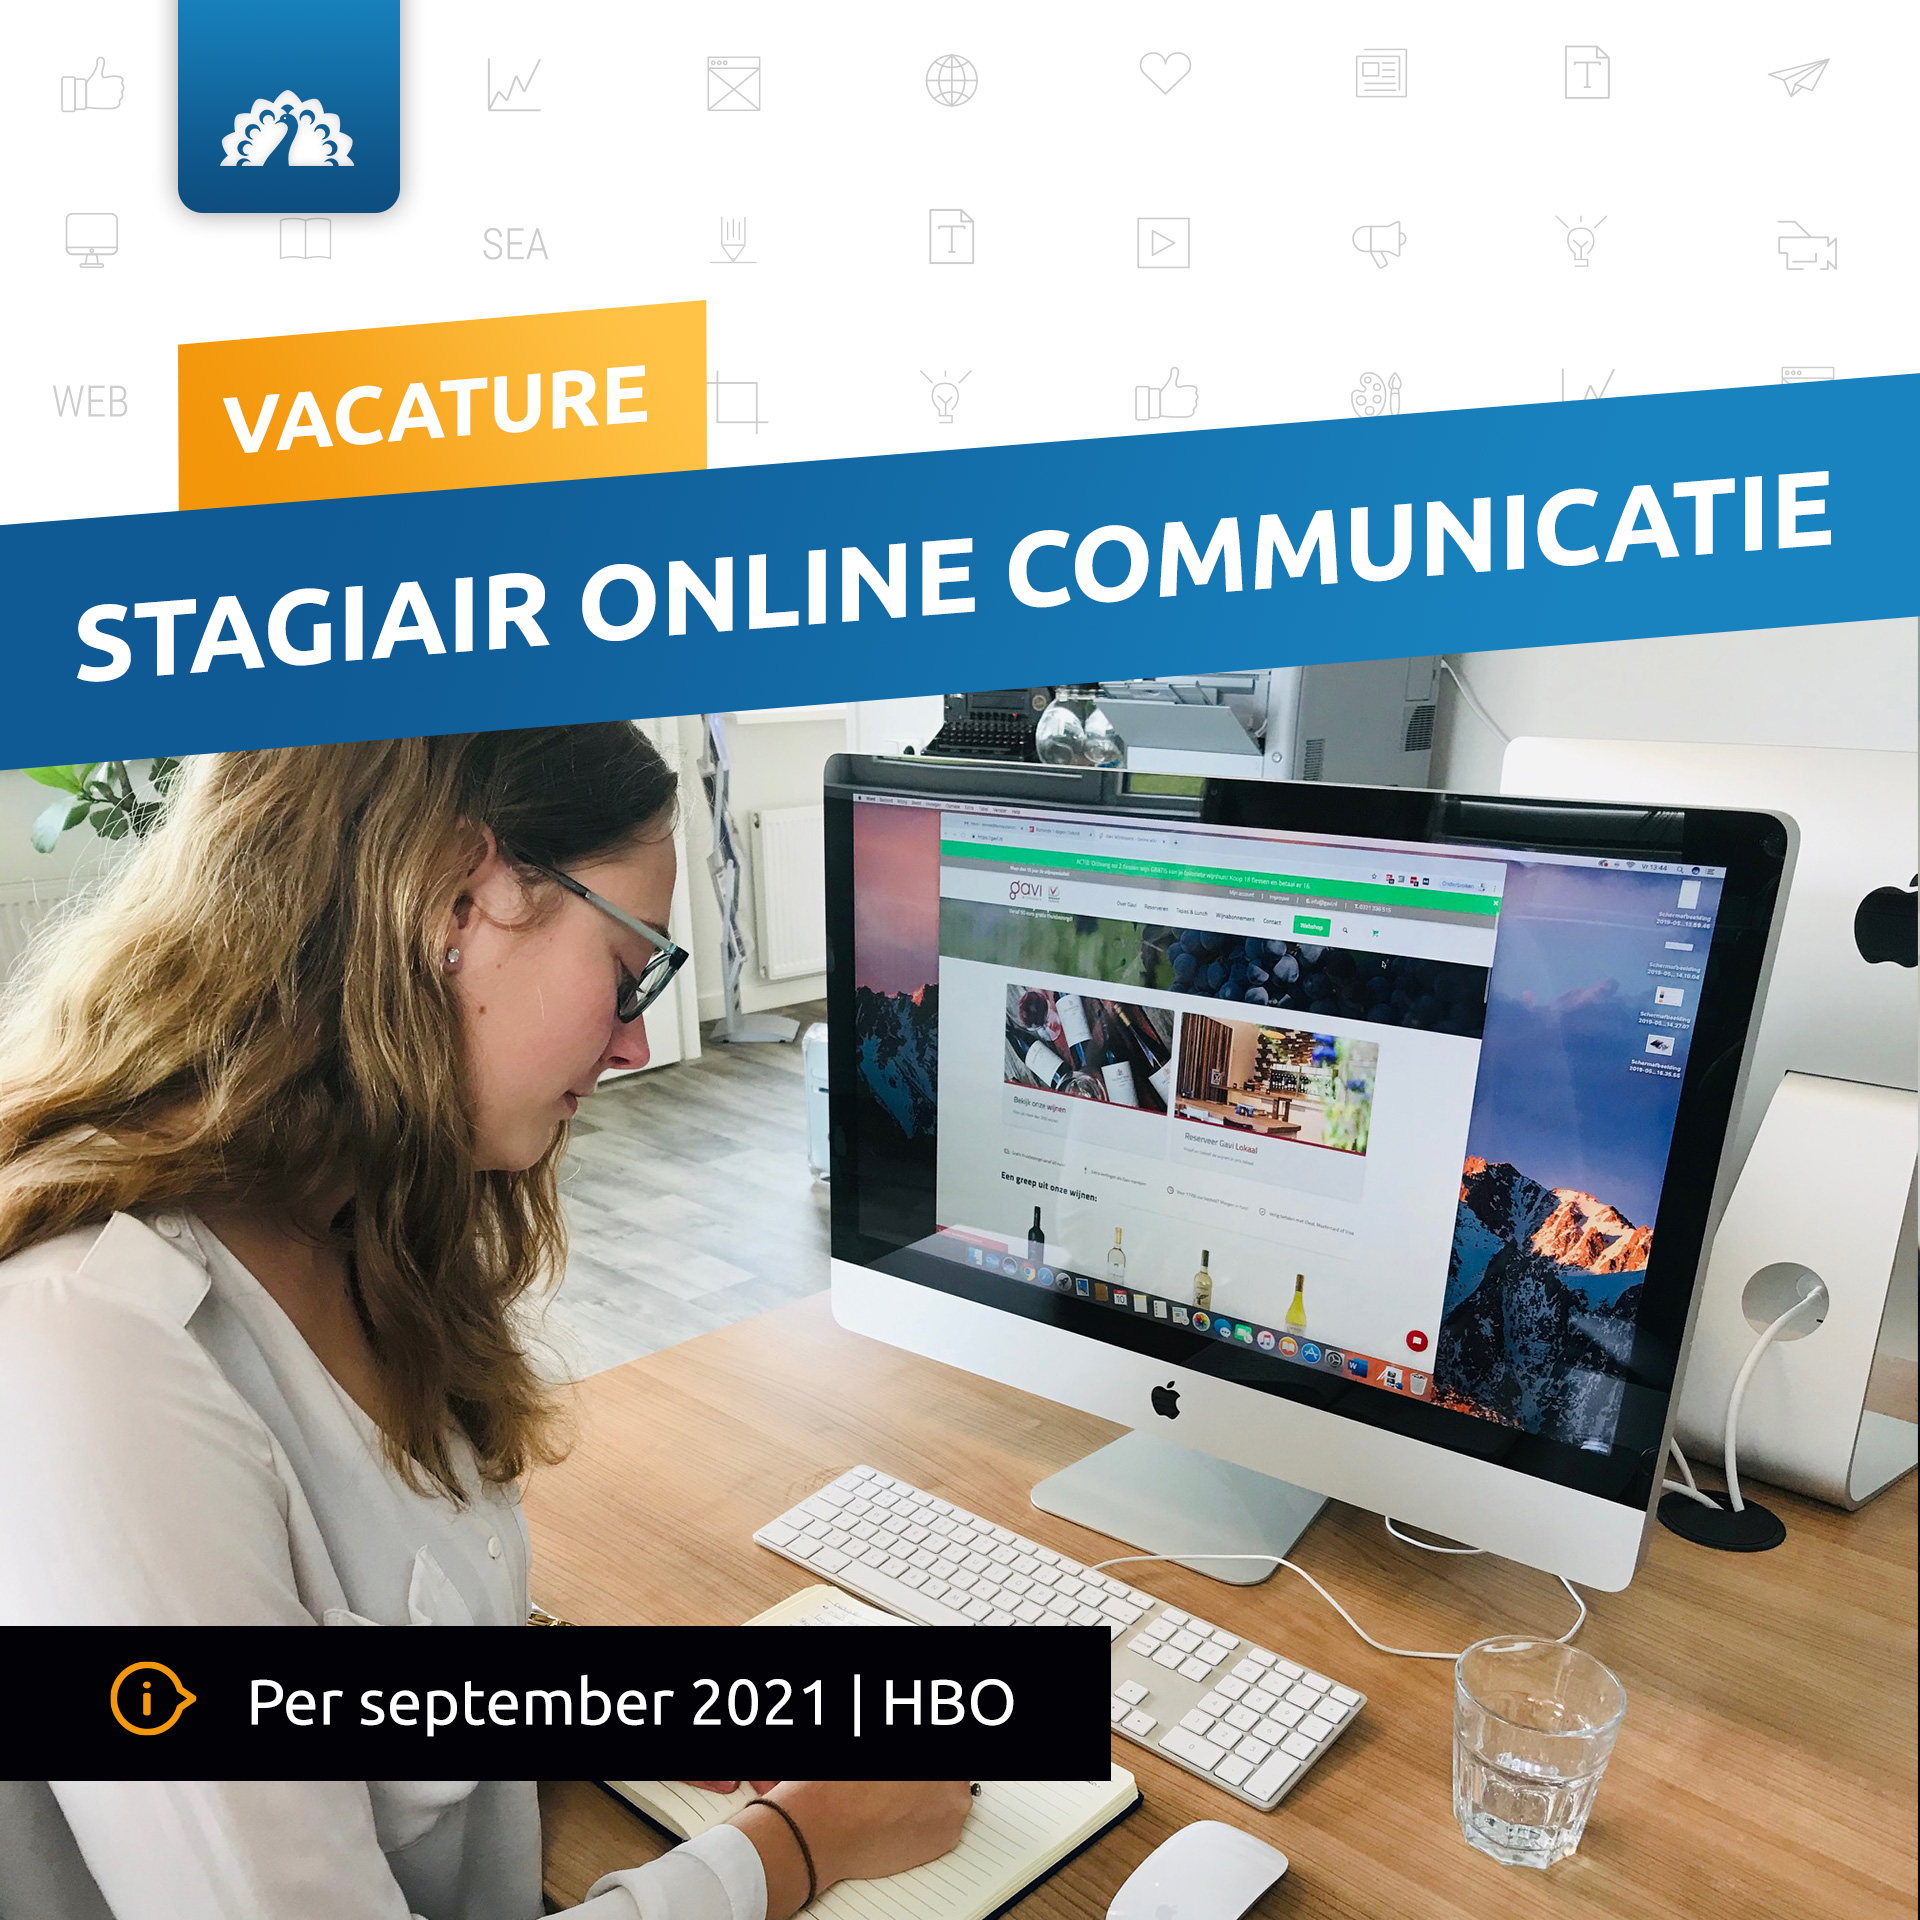 Bureau-Hanze-Vacature-stagair-communicatie